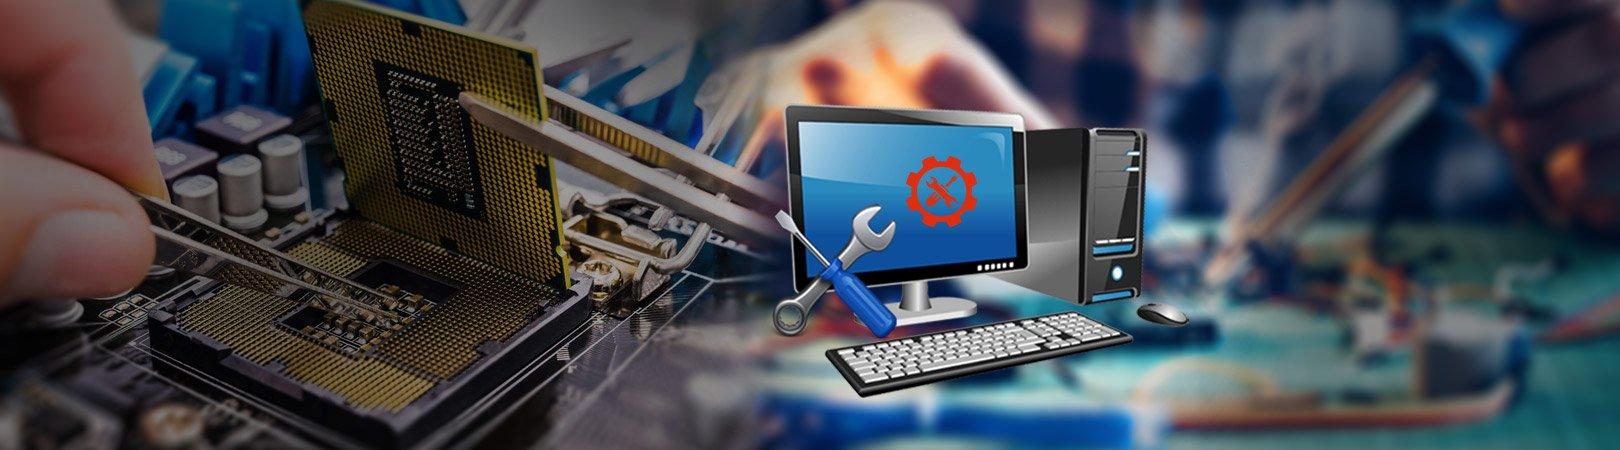 banner image - Acer Laptop Services Center